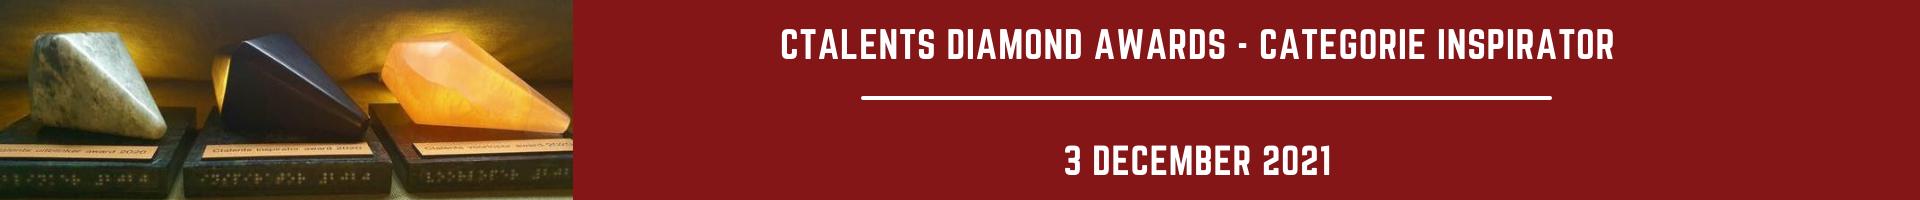 Ctalents Diamond Awards (2)